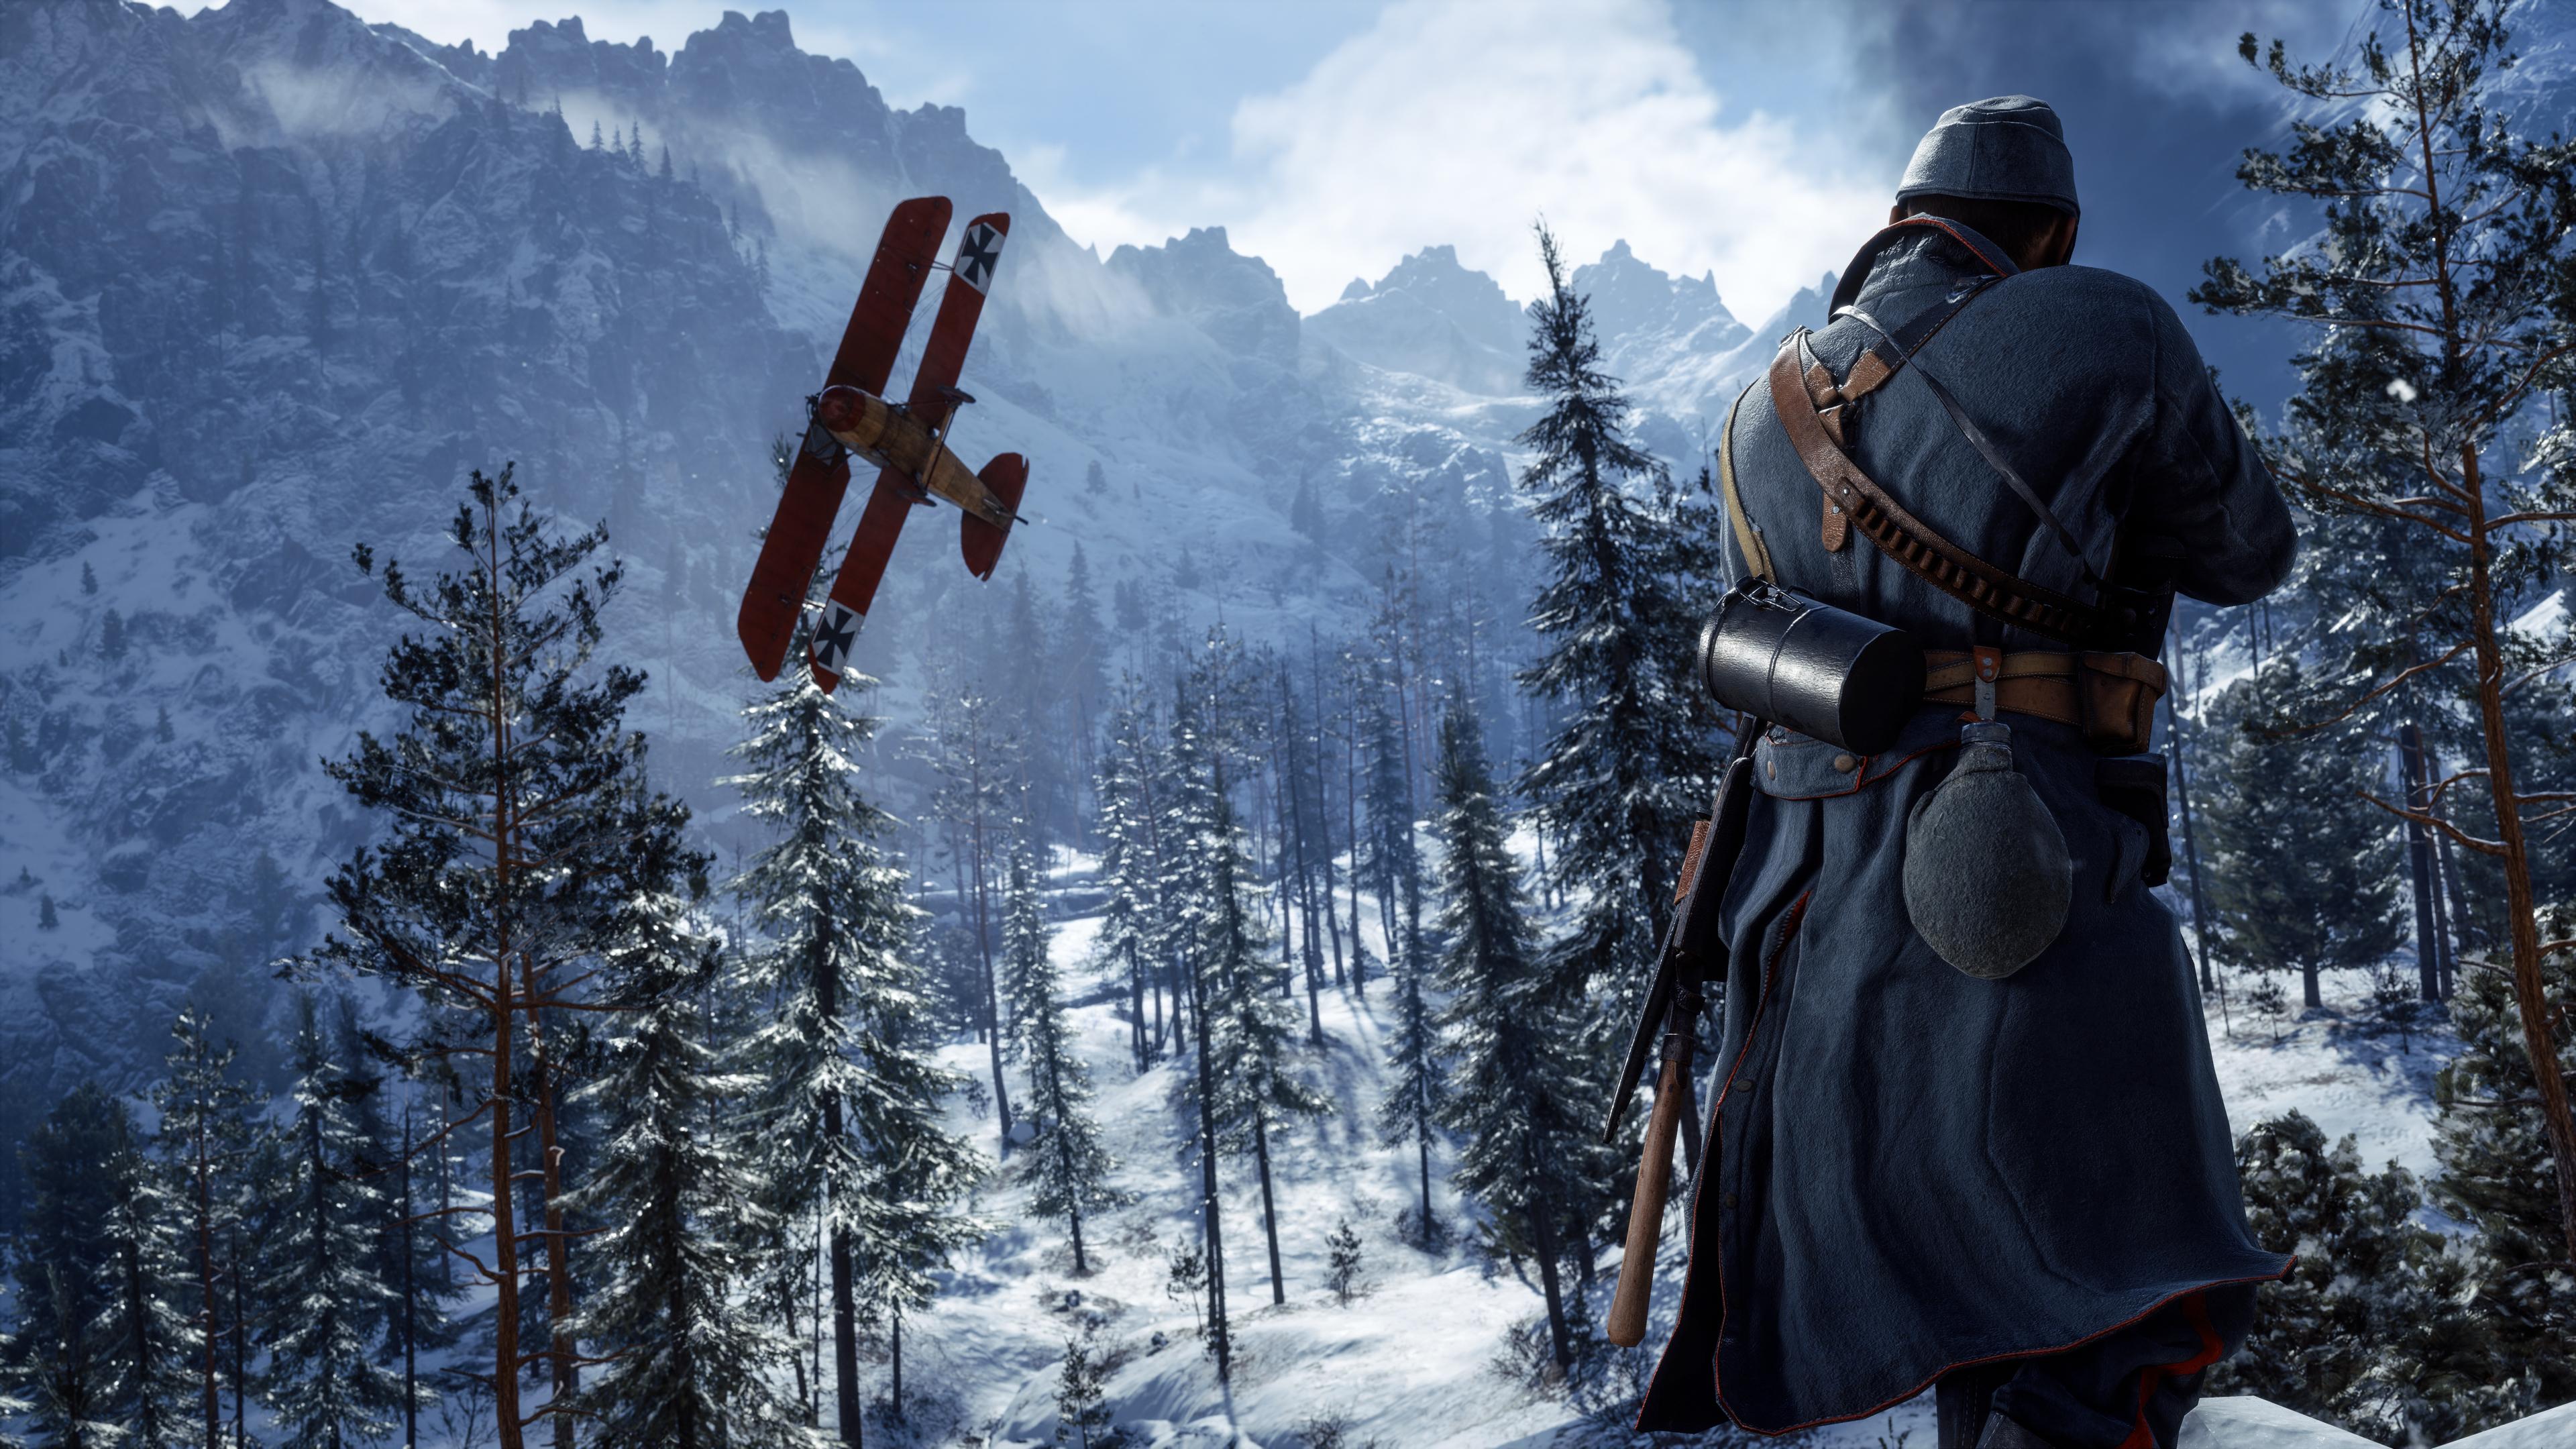 Battlefield 1 Feiert Ersten Geburtstag 4k, HD Games, 4k ...